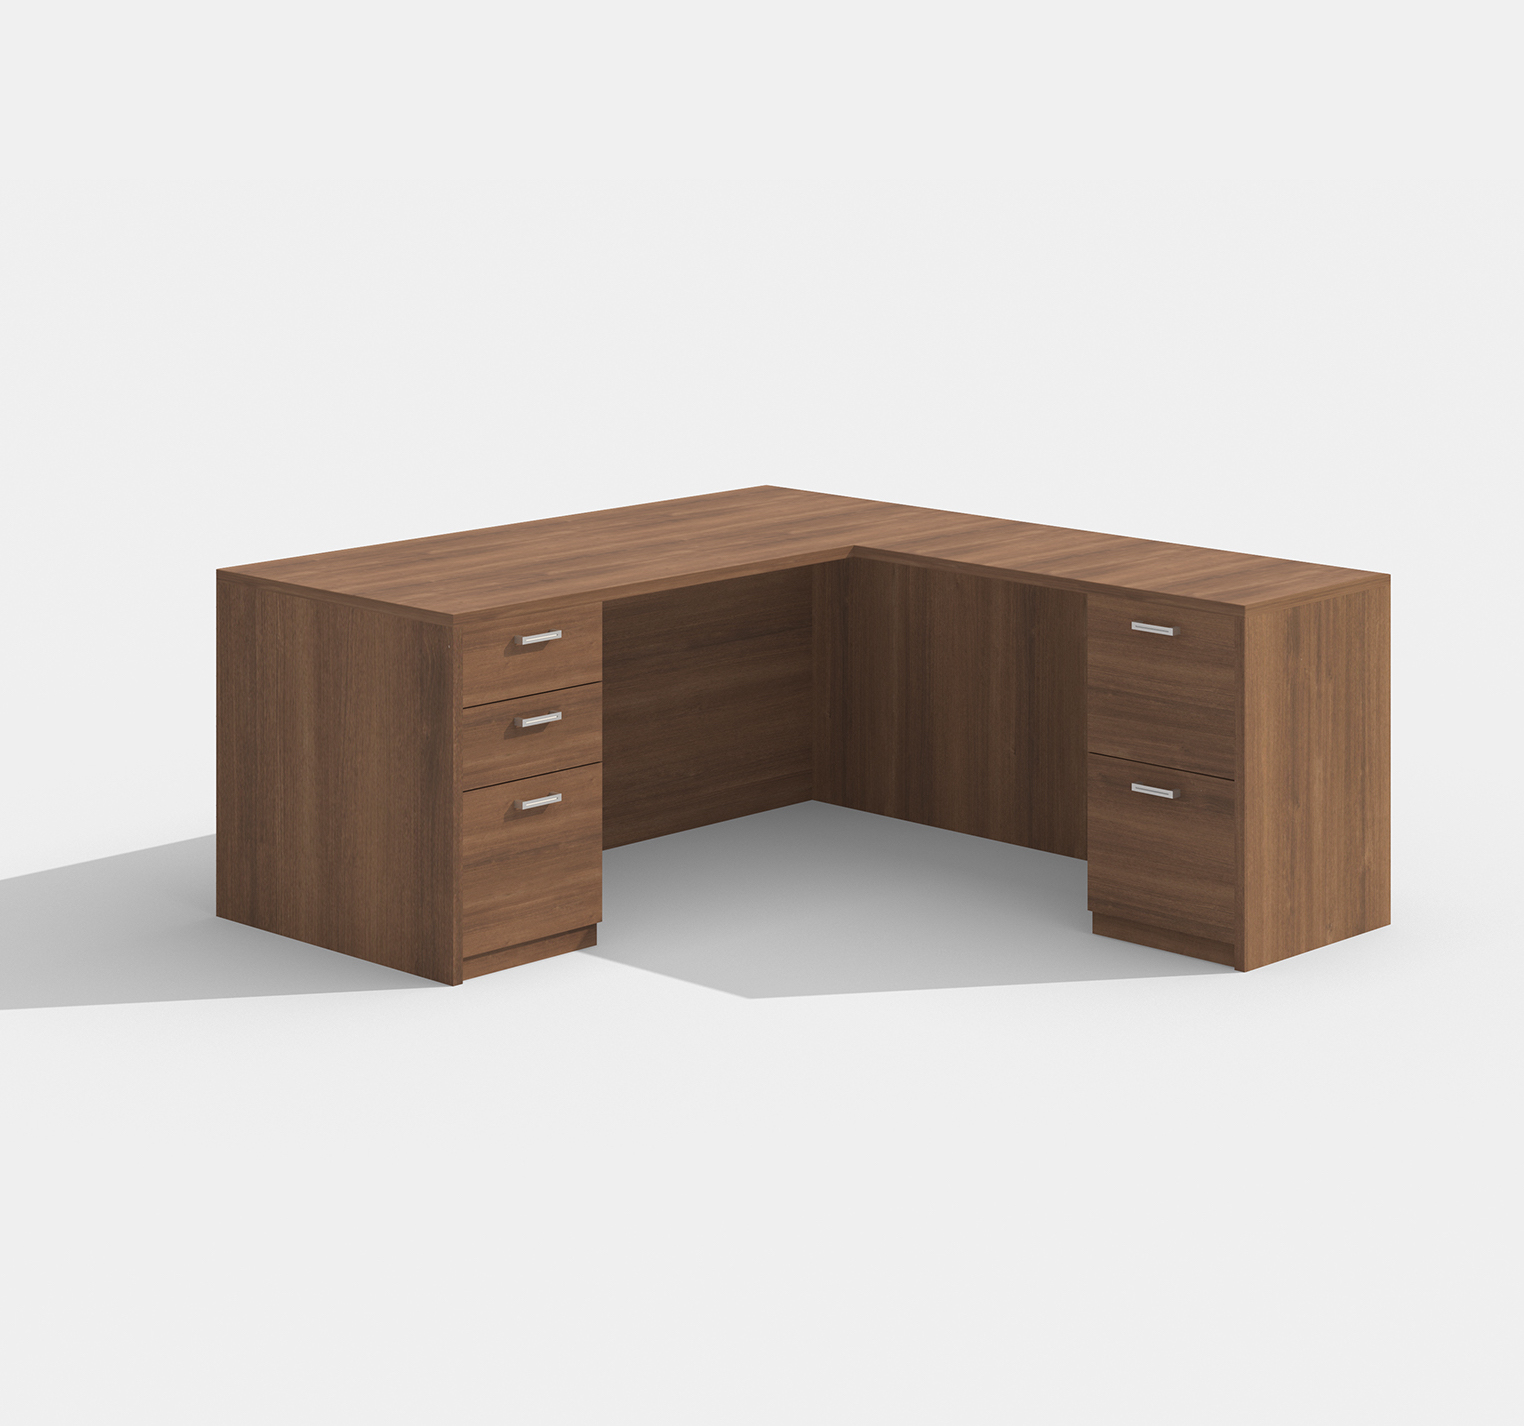 am-417n amber l-desk in walnut